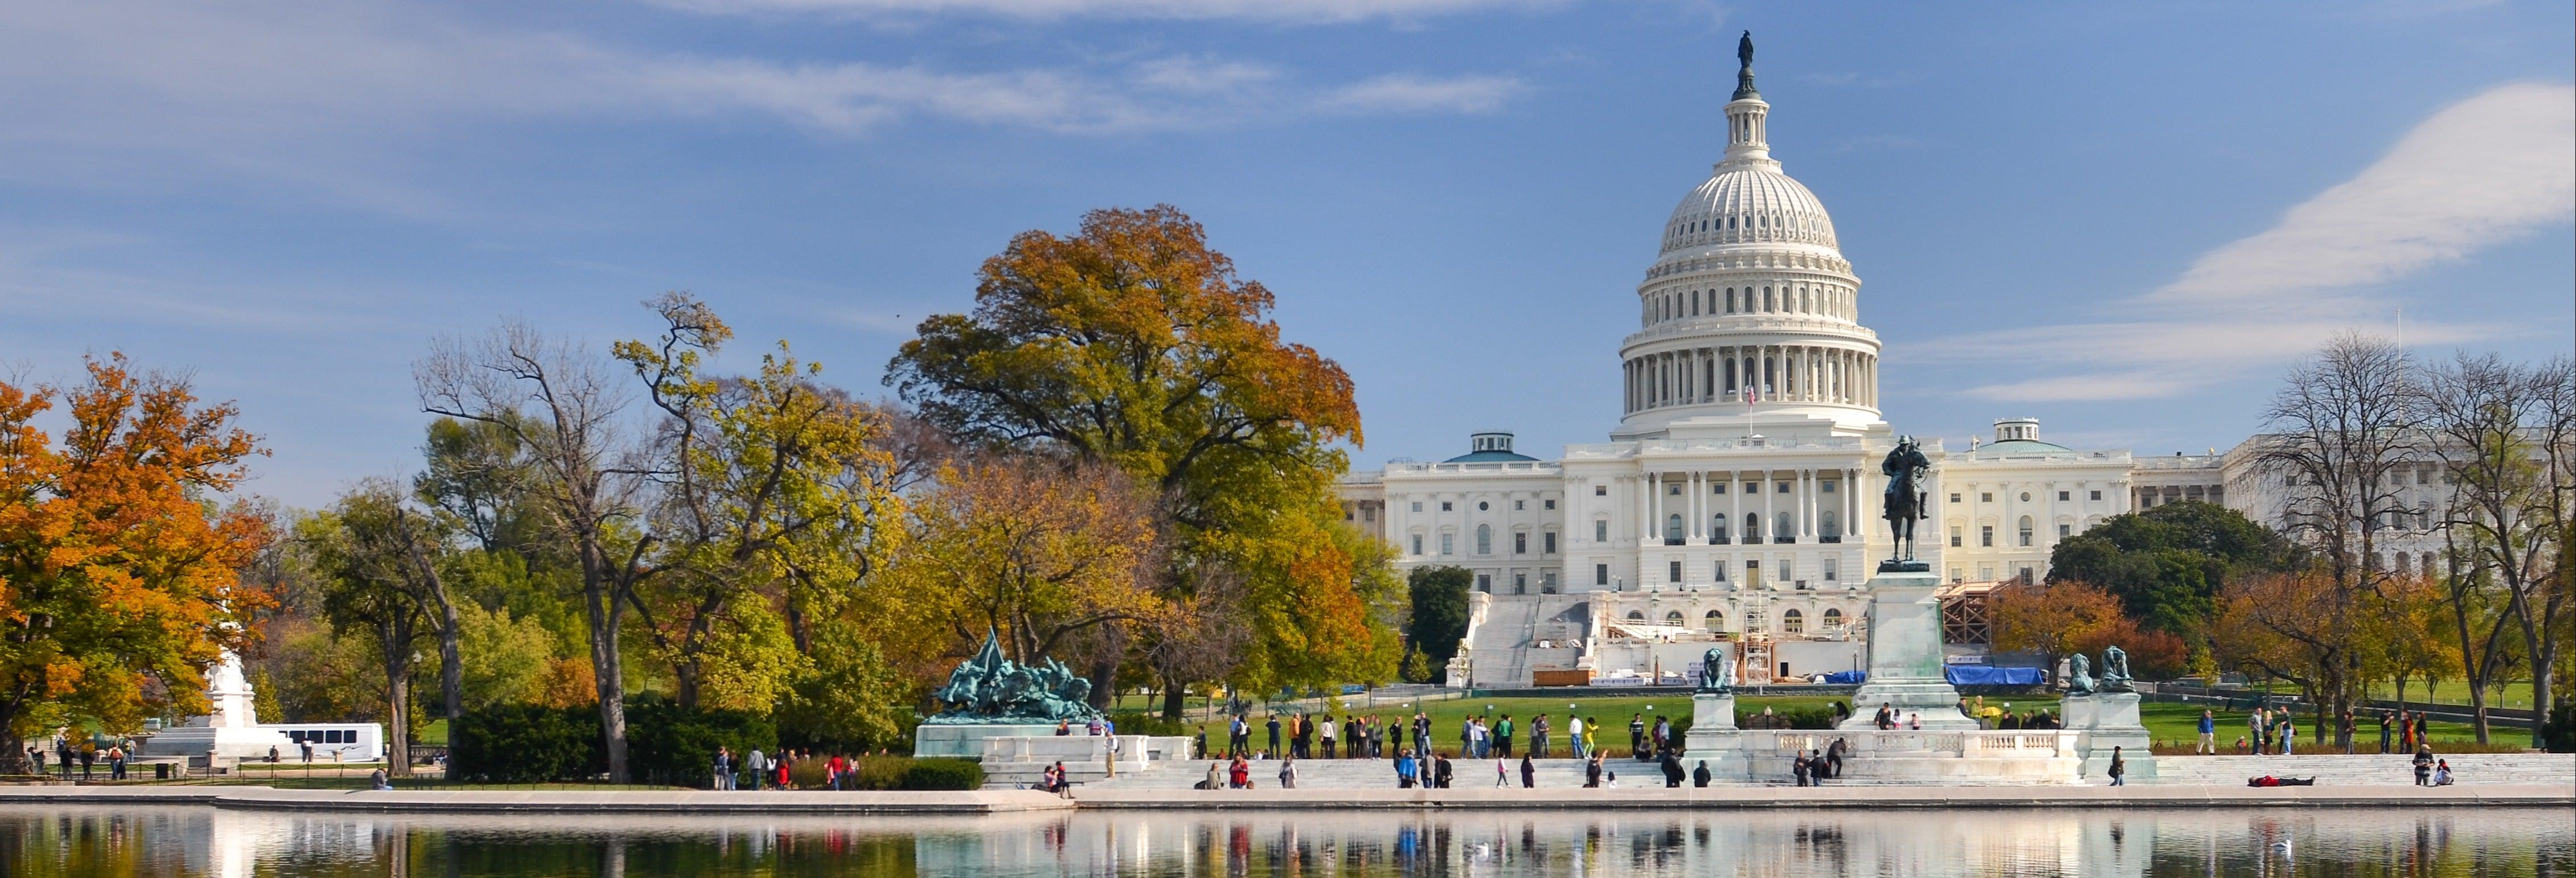 Tour privado por Washington